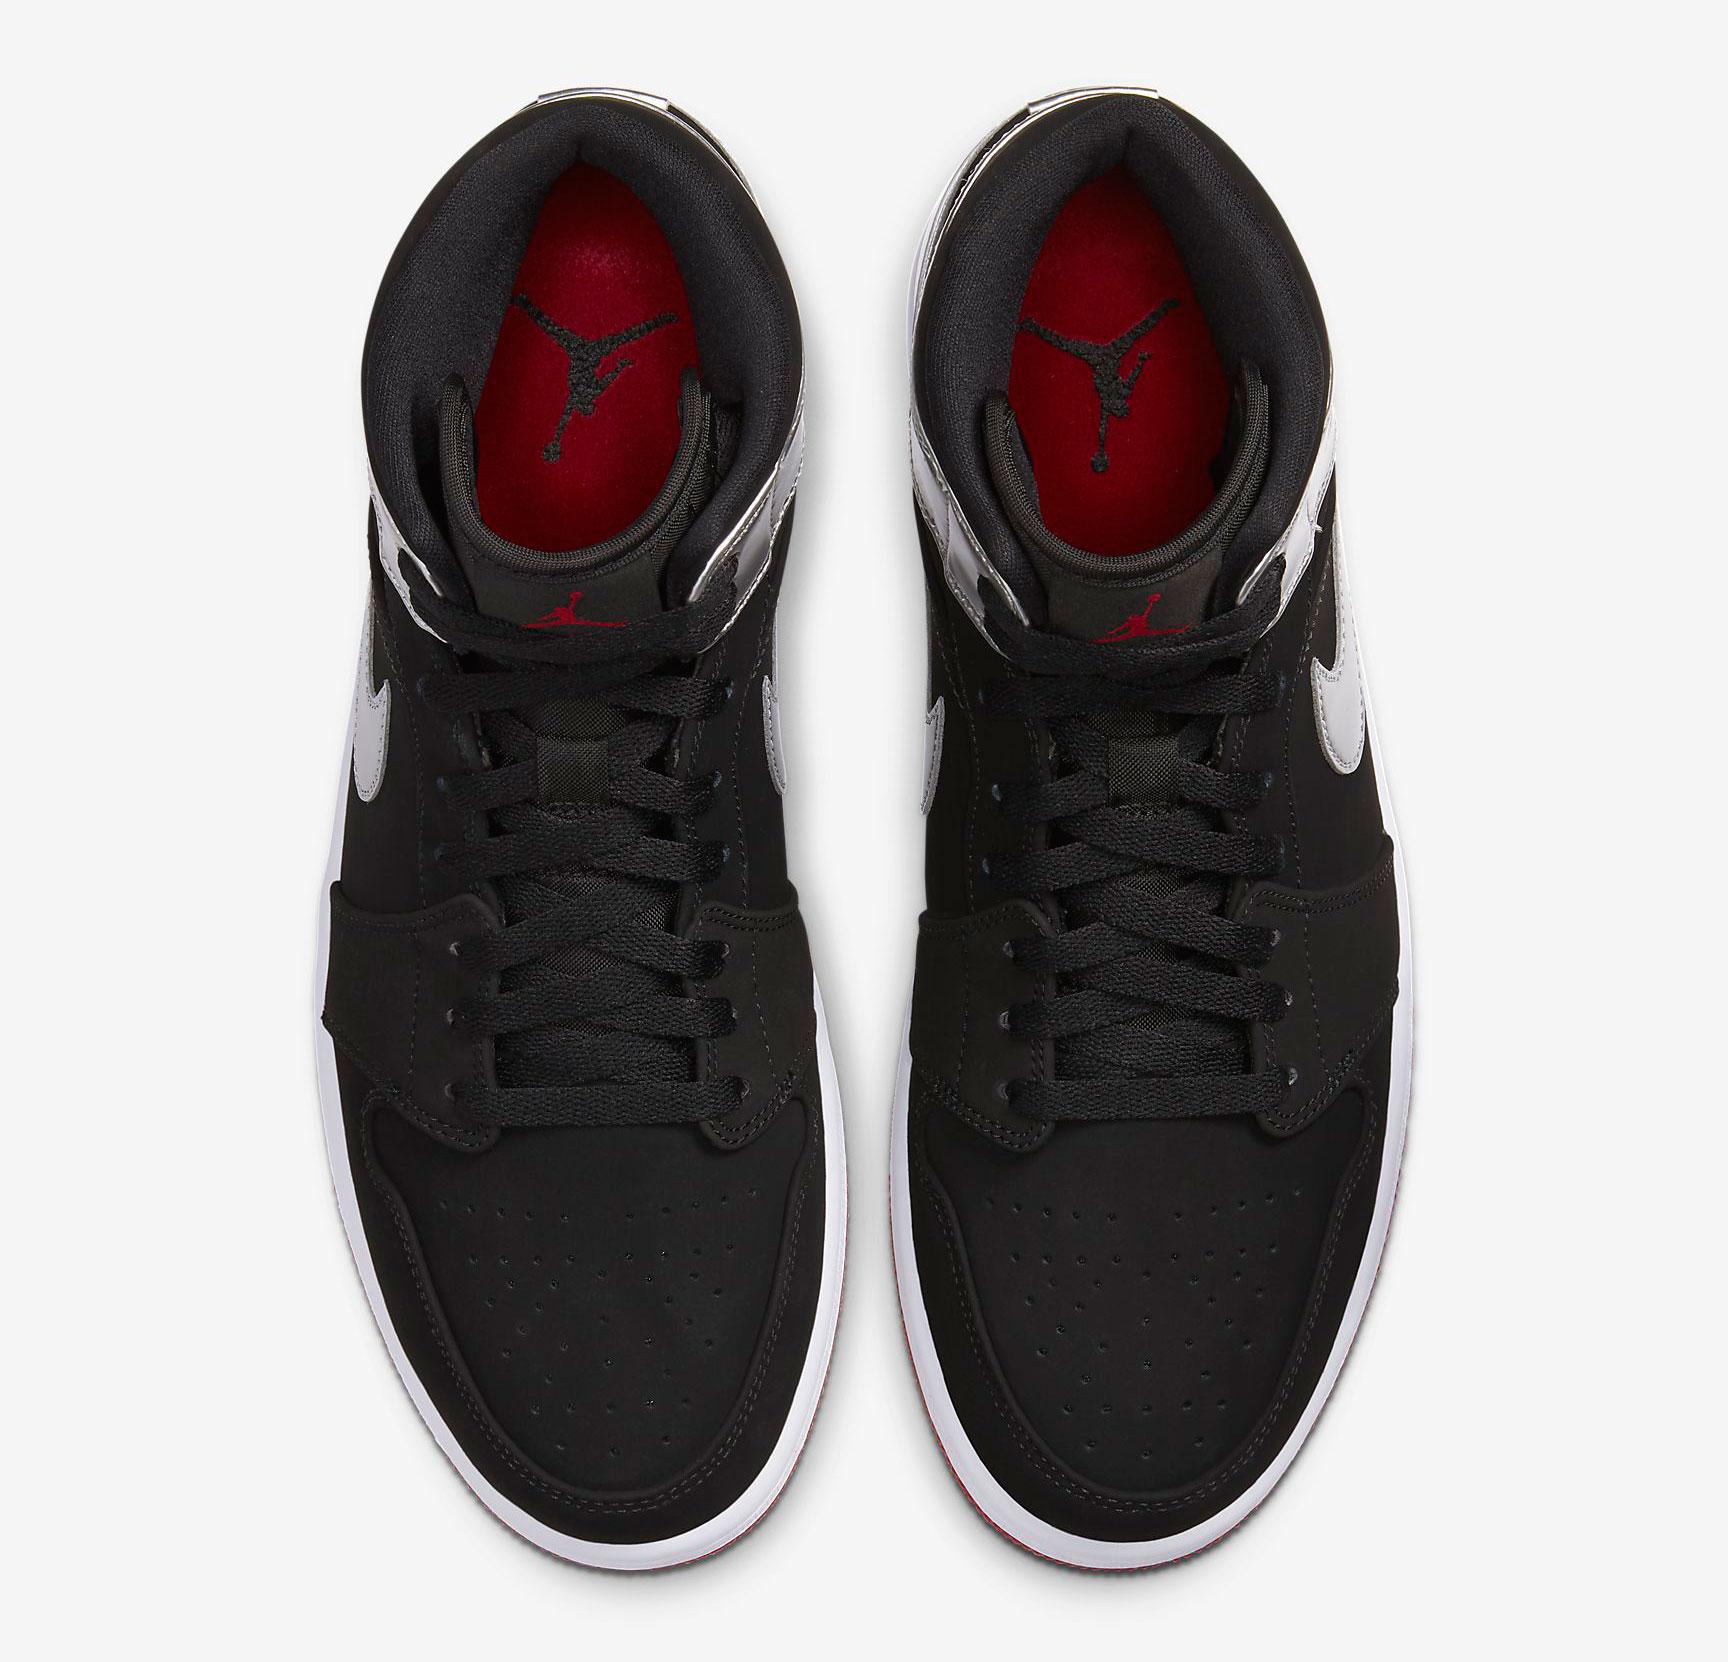 air-jordan-1-mid-black-silver-red-4